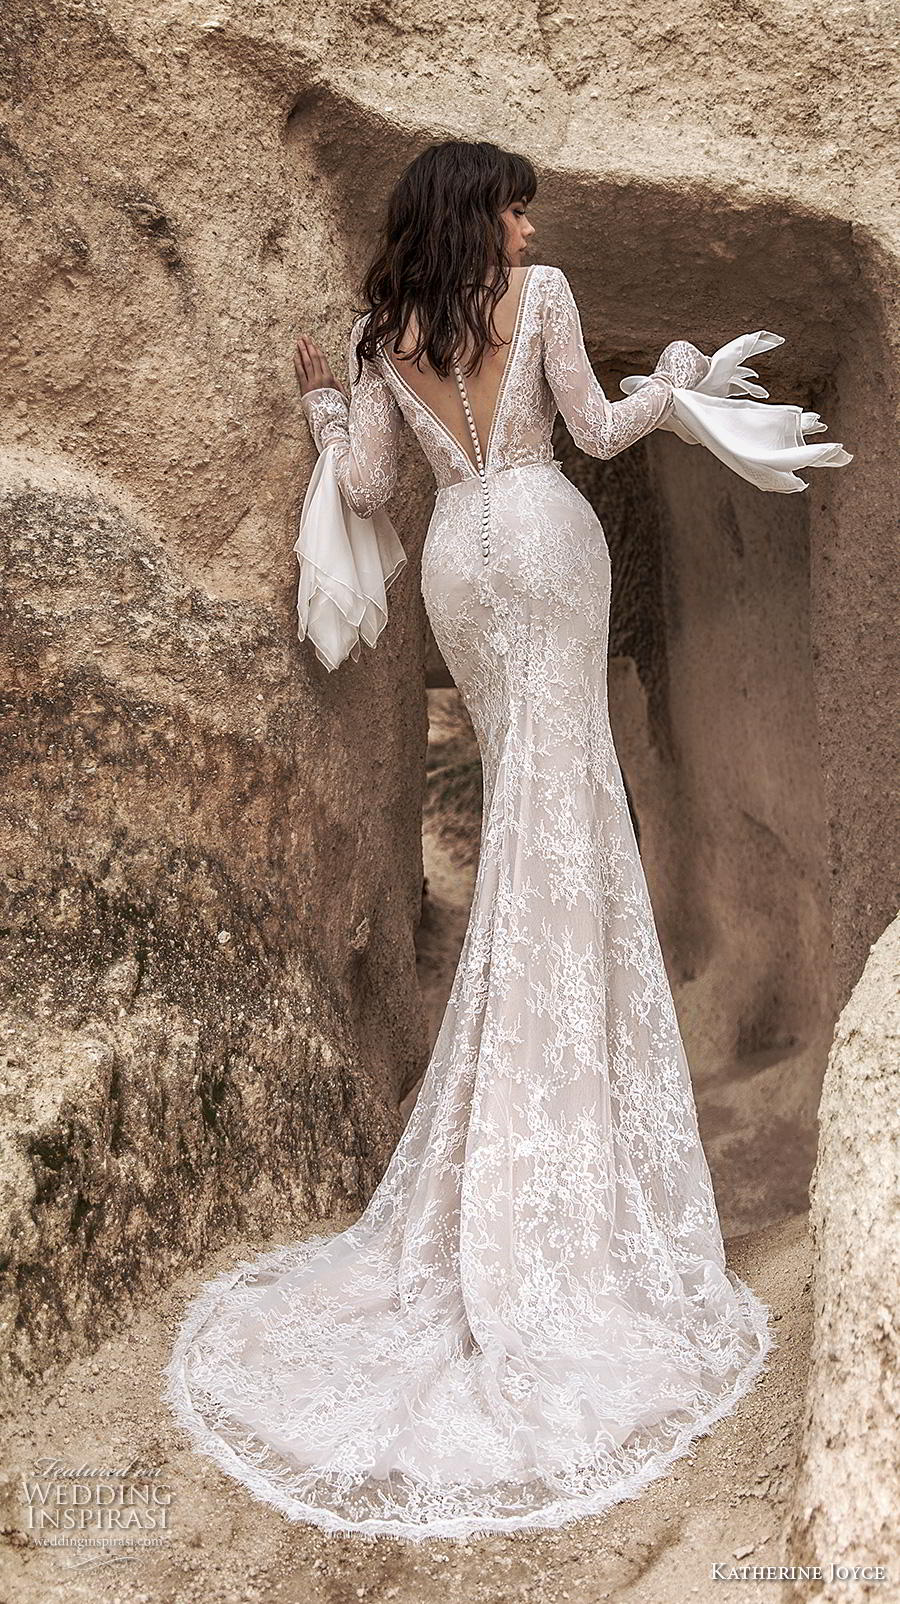 katherine joyce 2020 bridal long sleeves deep plunging v neck full embellishment slit skirt elegant sheath wedding dress v back sweep train (12) bv